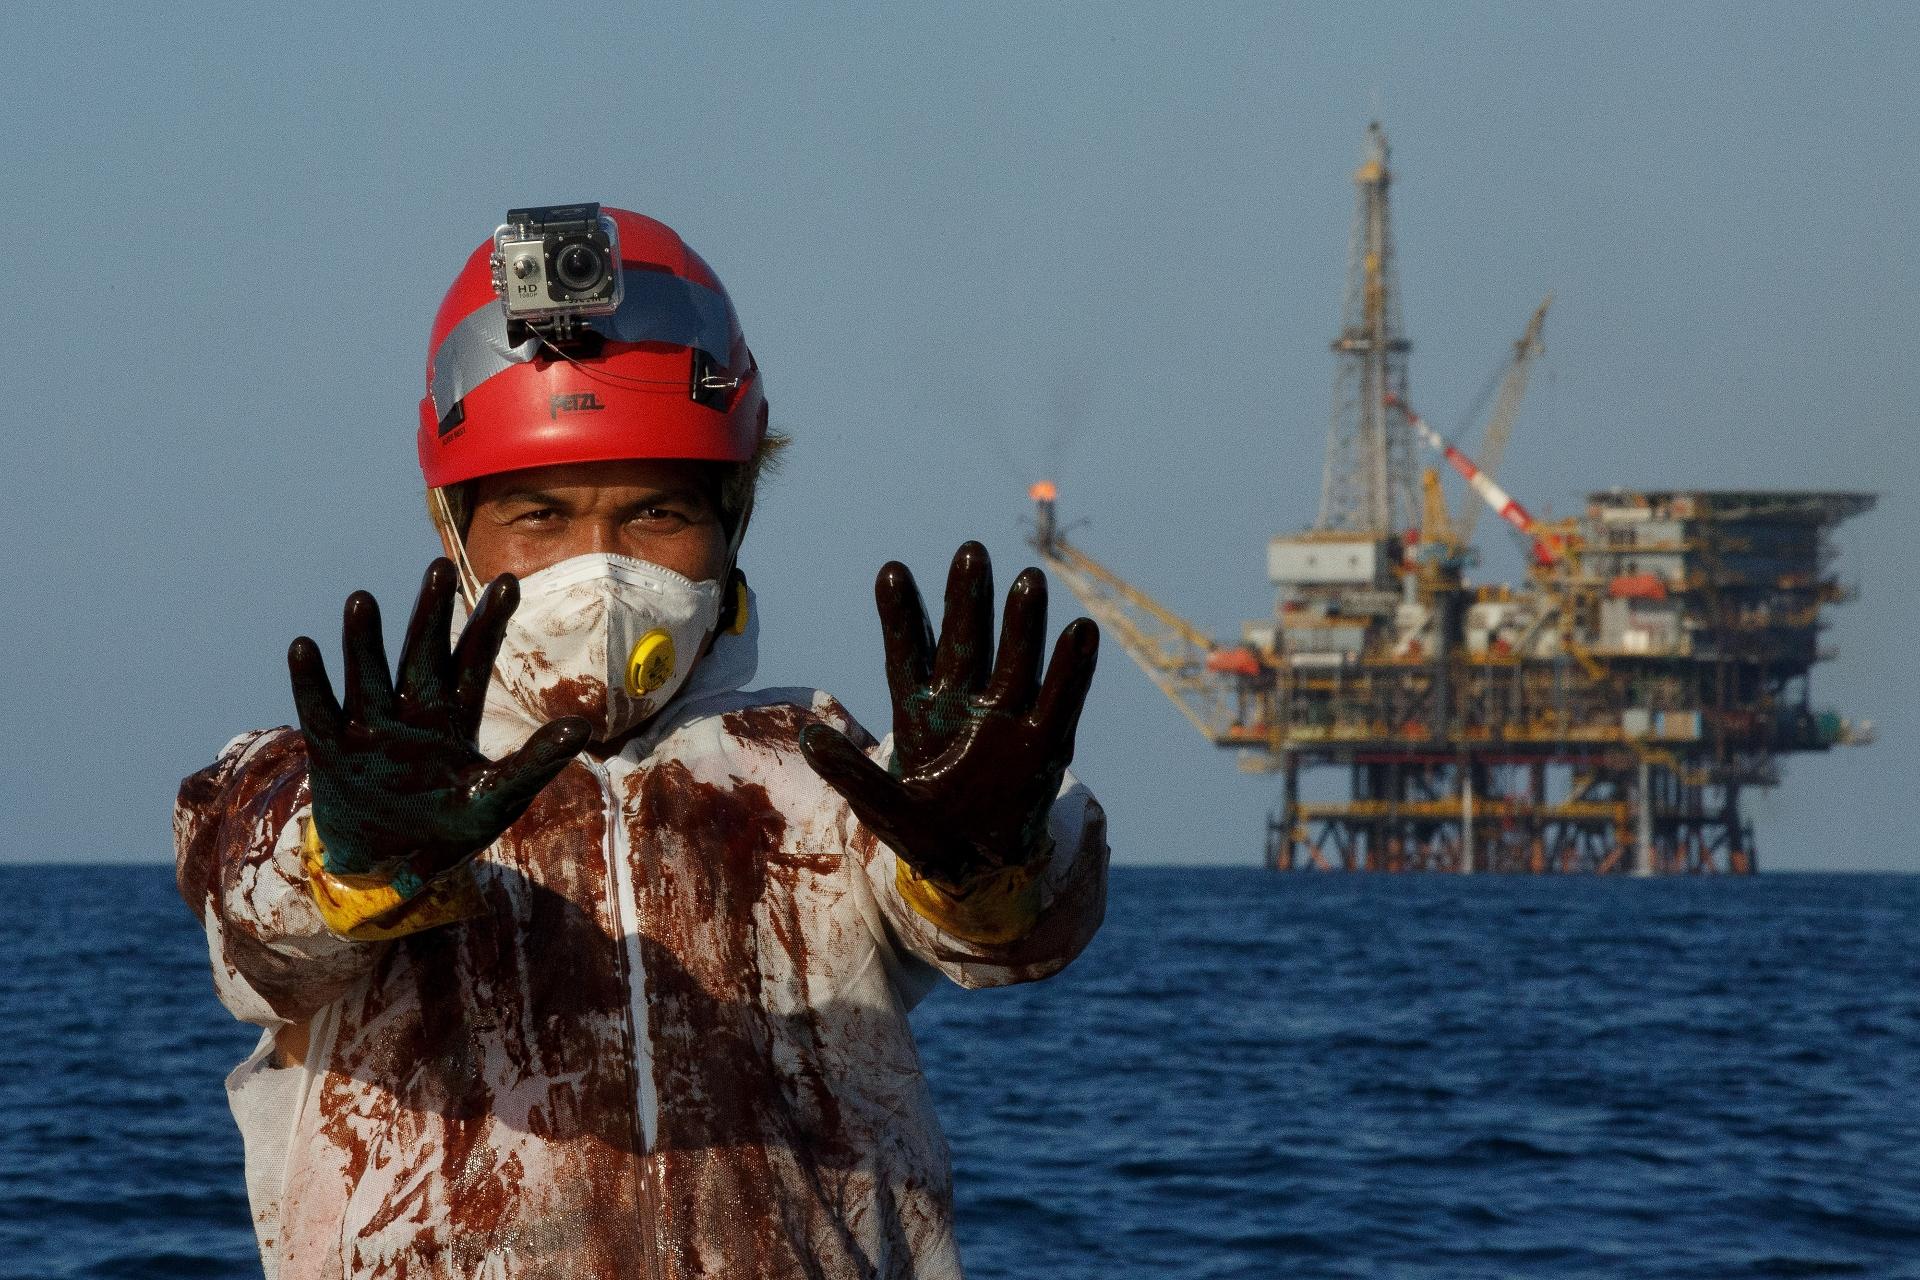 H Μεσόγειος που διώχνει </br>τις πετρελαϊκές